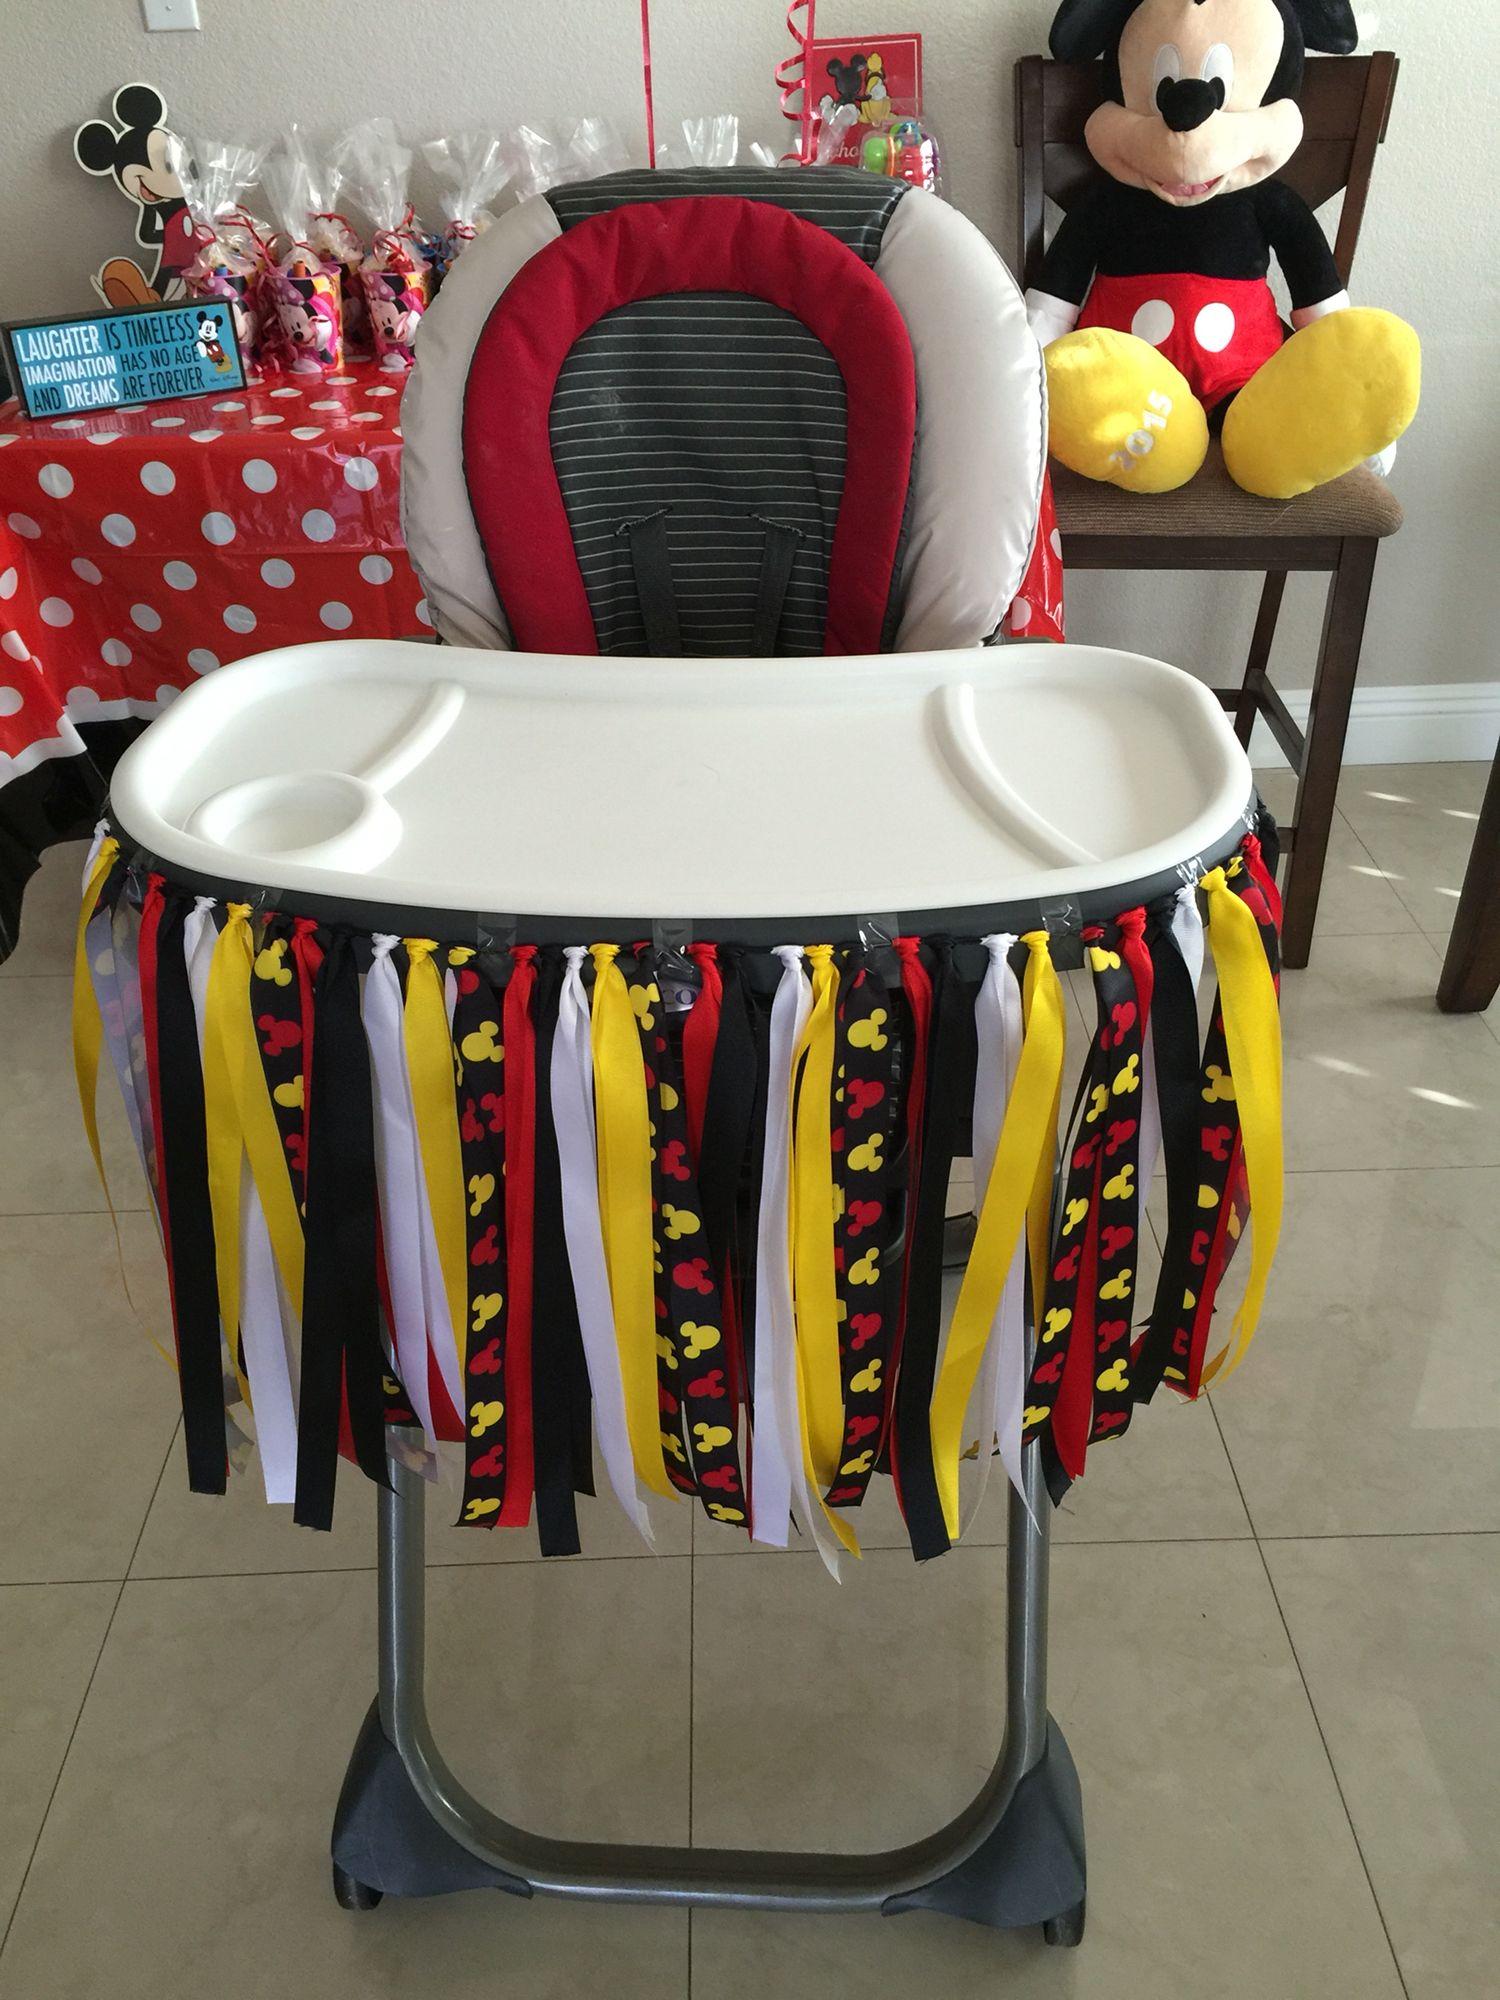 Dog Birthday Decorations Mickey Mouse Birthday Party Idea For Hot Diggity Dog Bar Wyatts